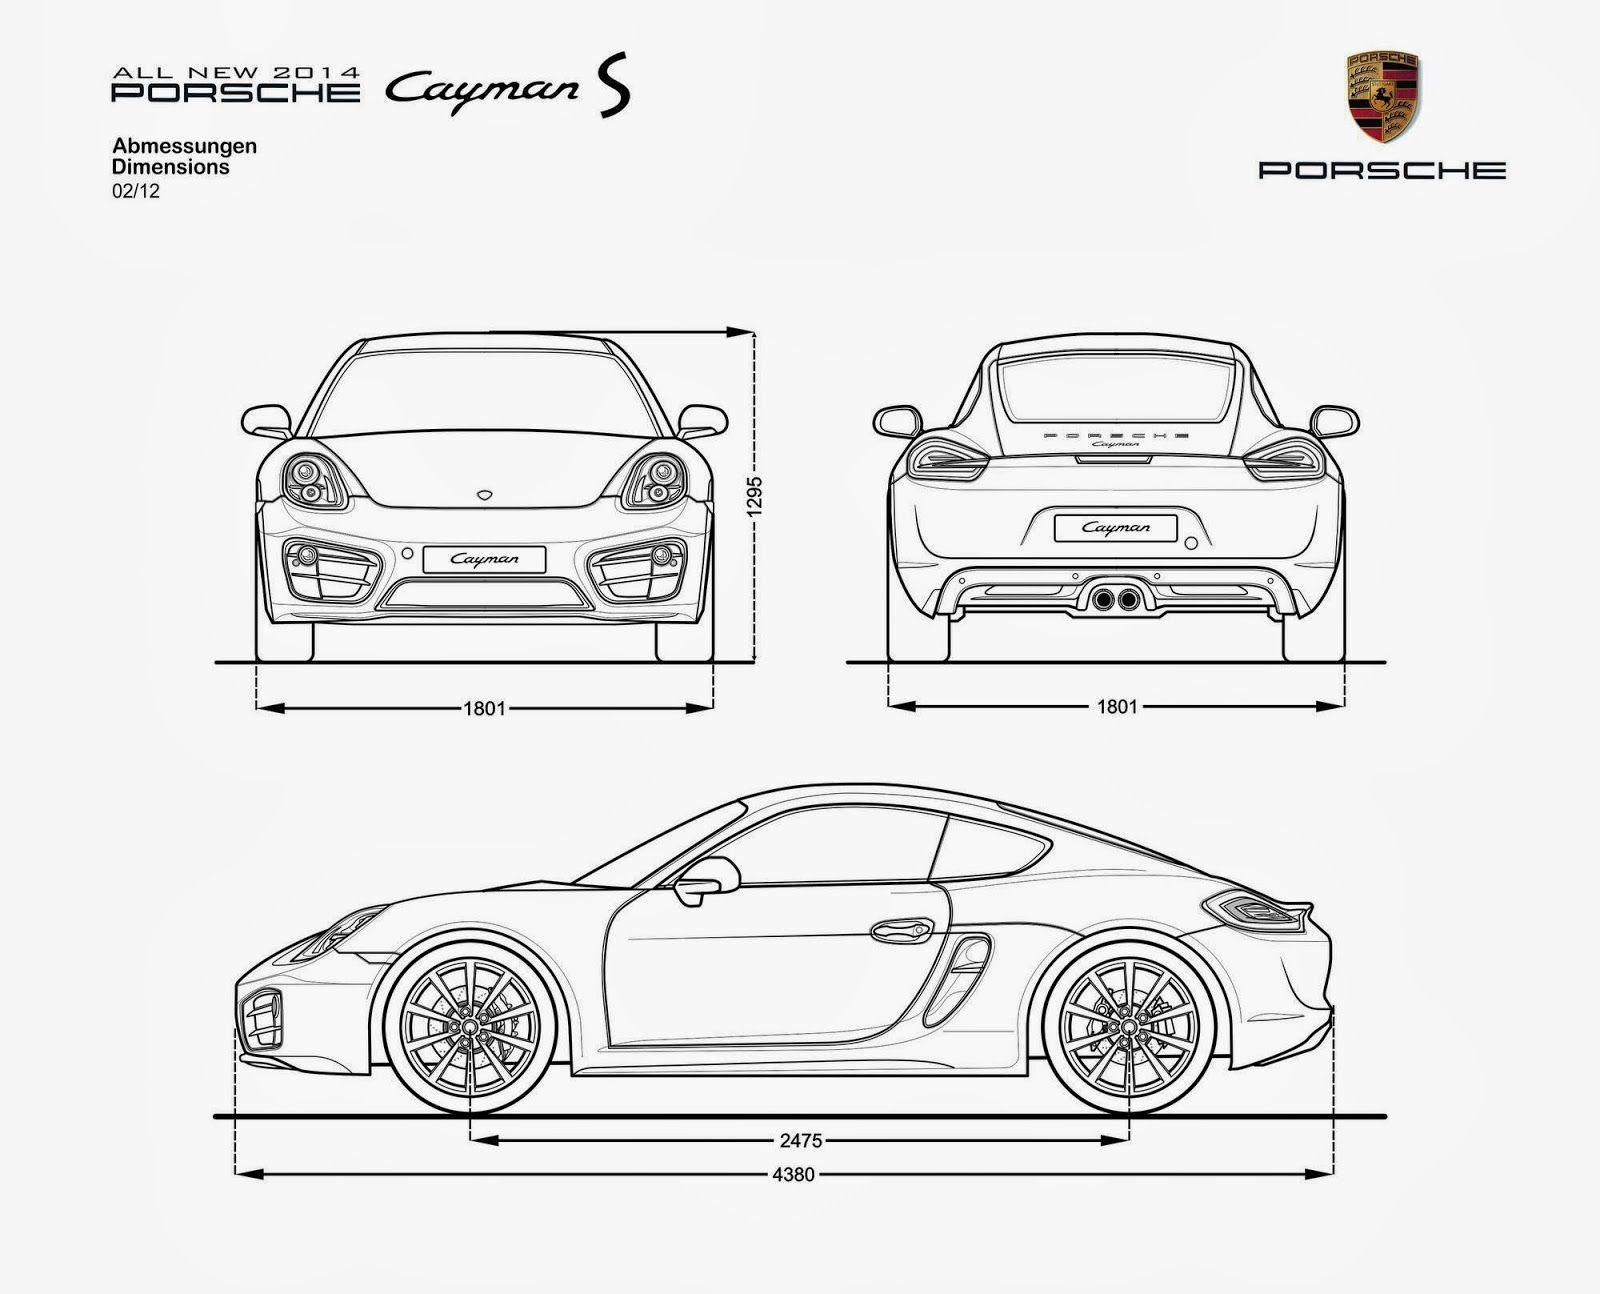 A Porsche Cayman S Blueprints Cgfrog Com 1